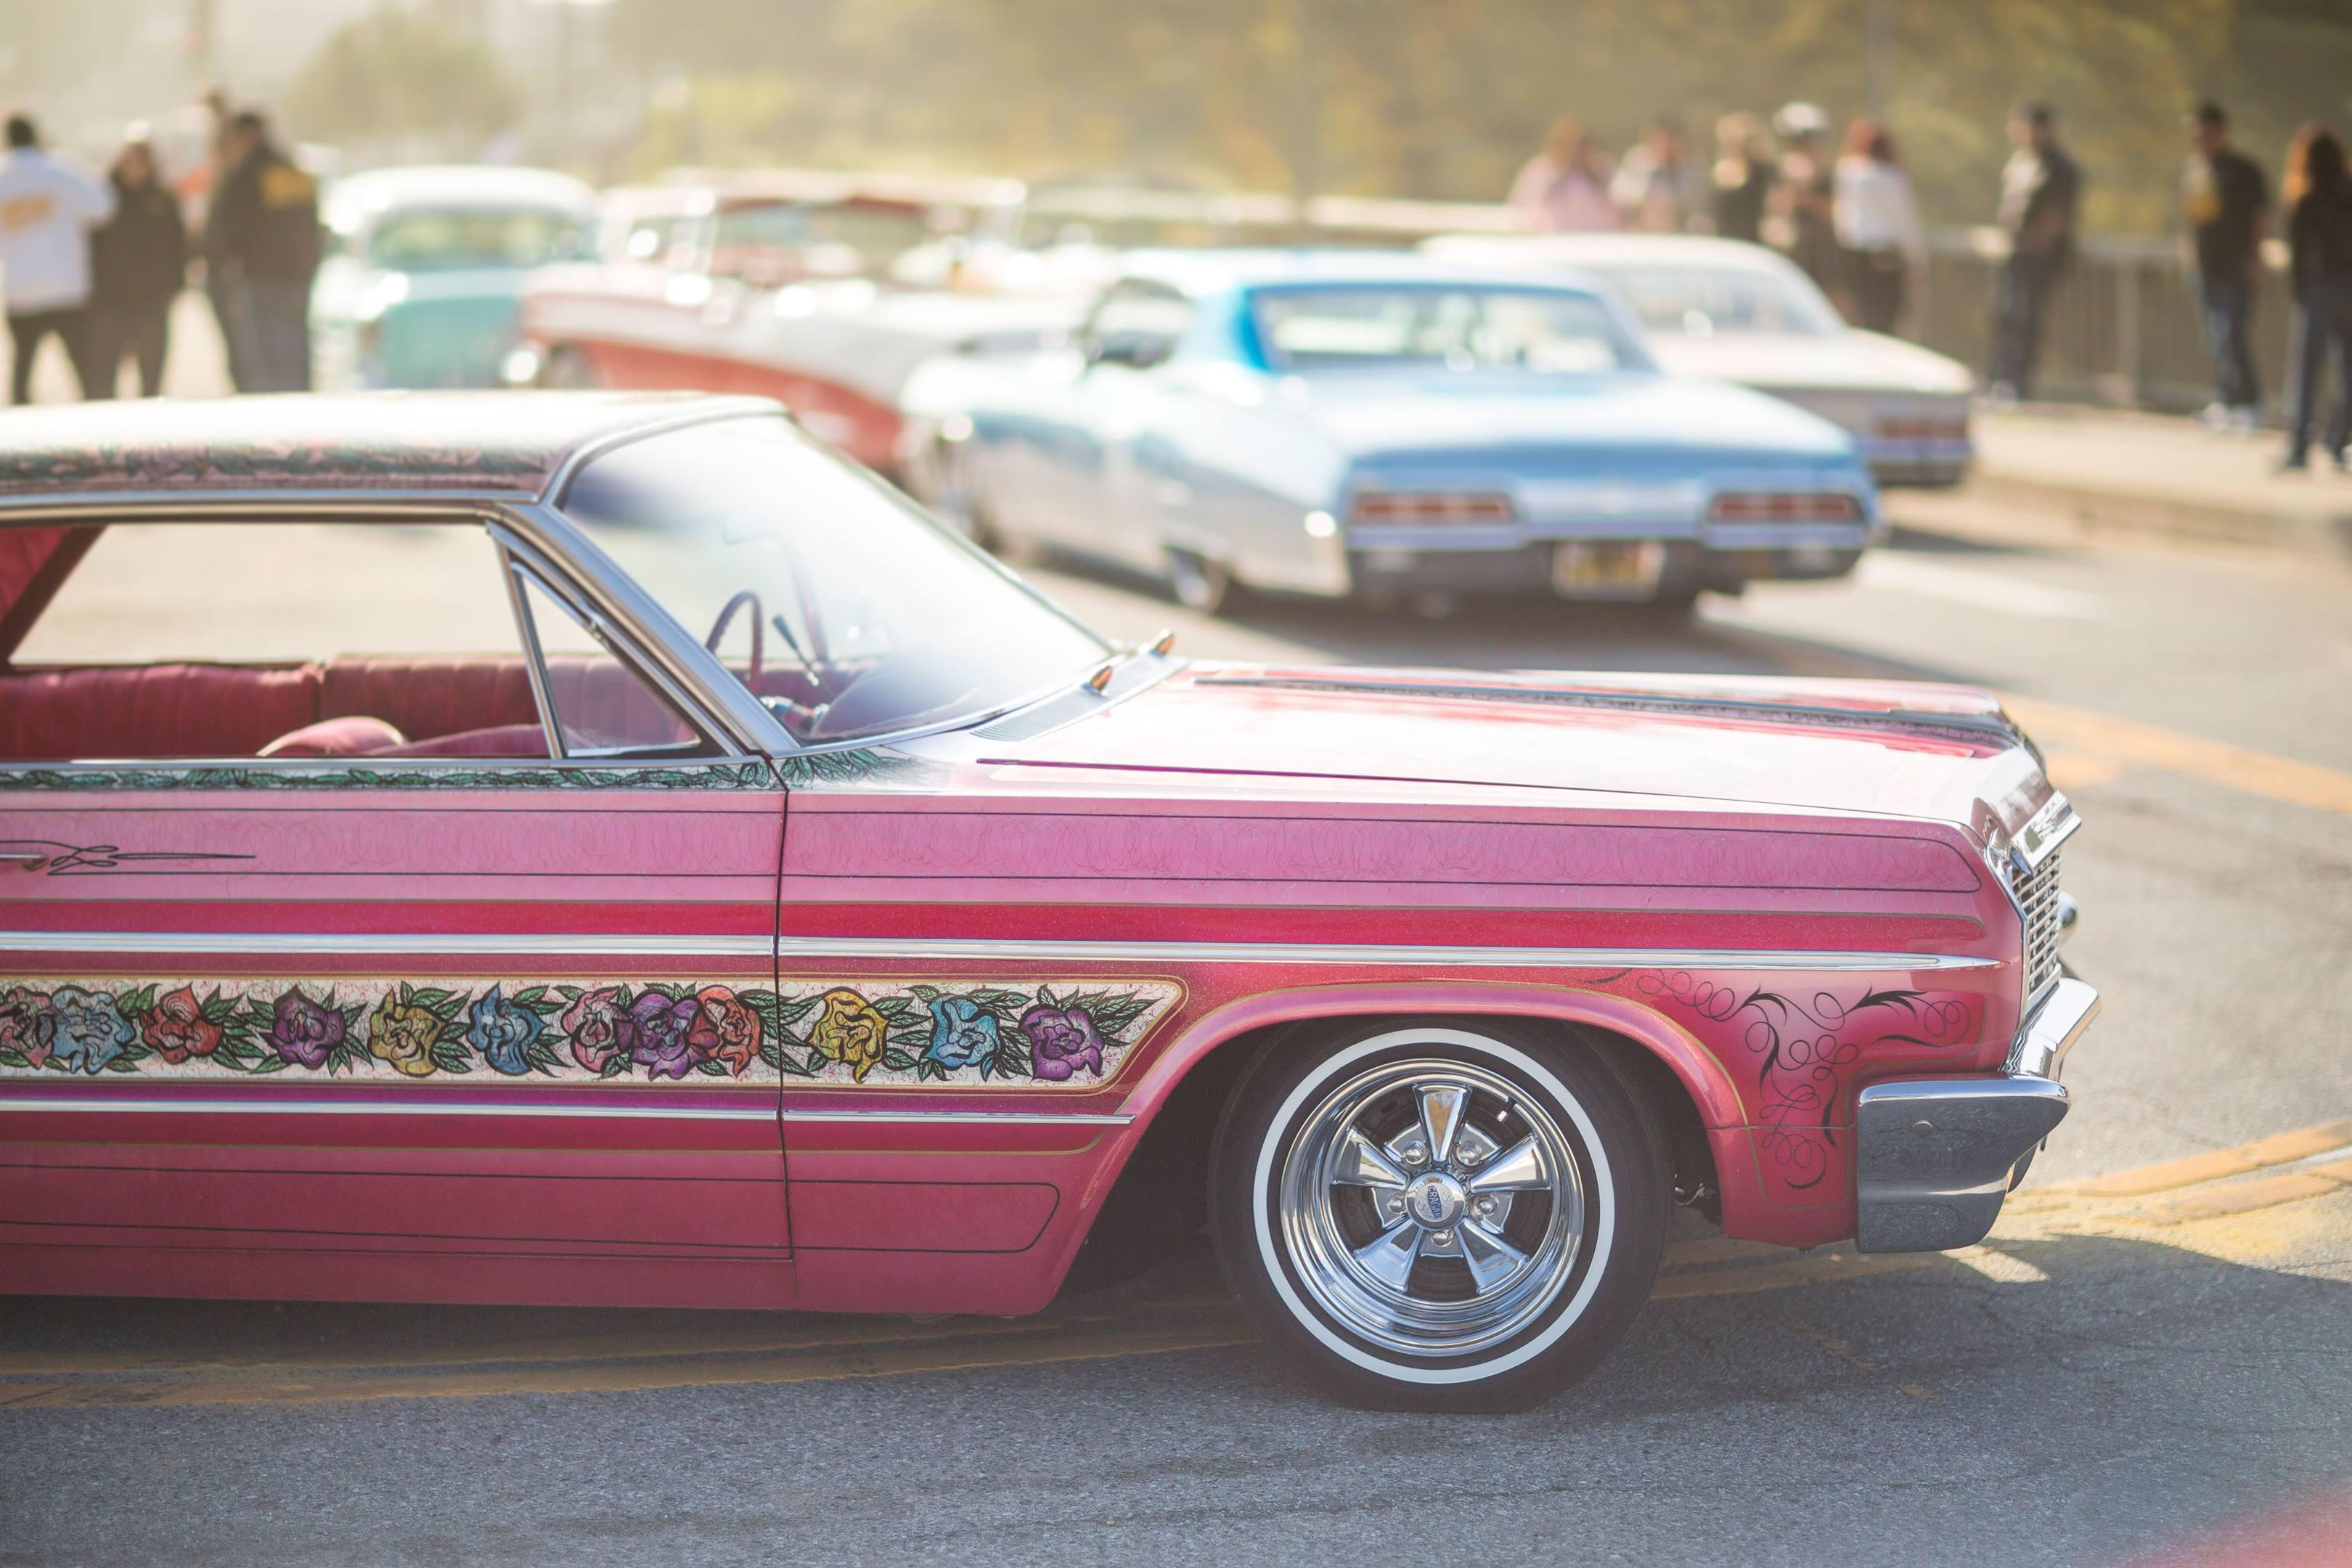 1964 Chevy Impala low rider